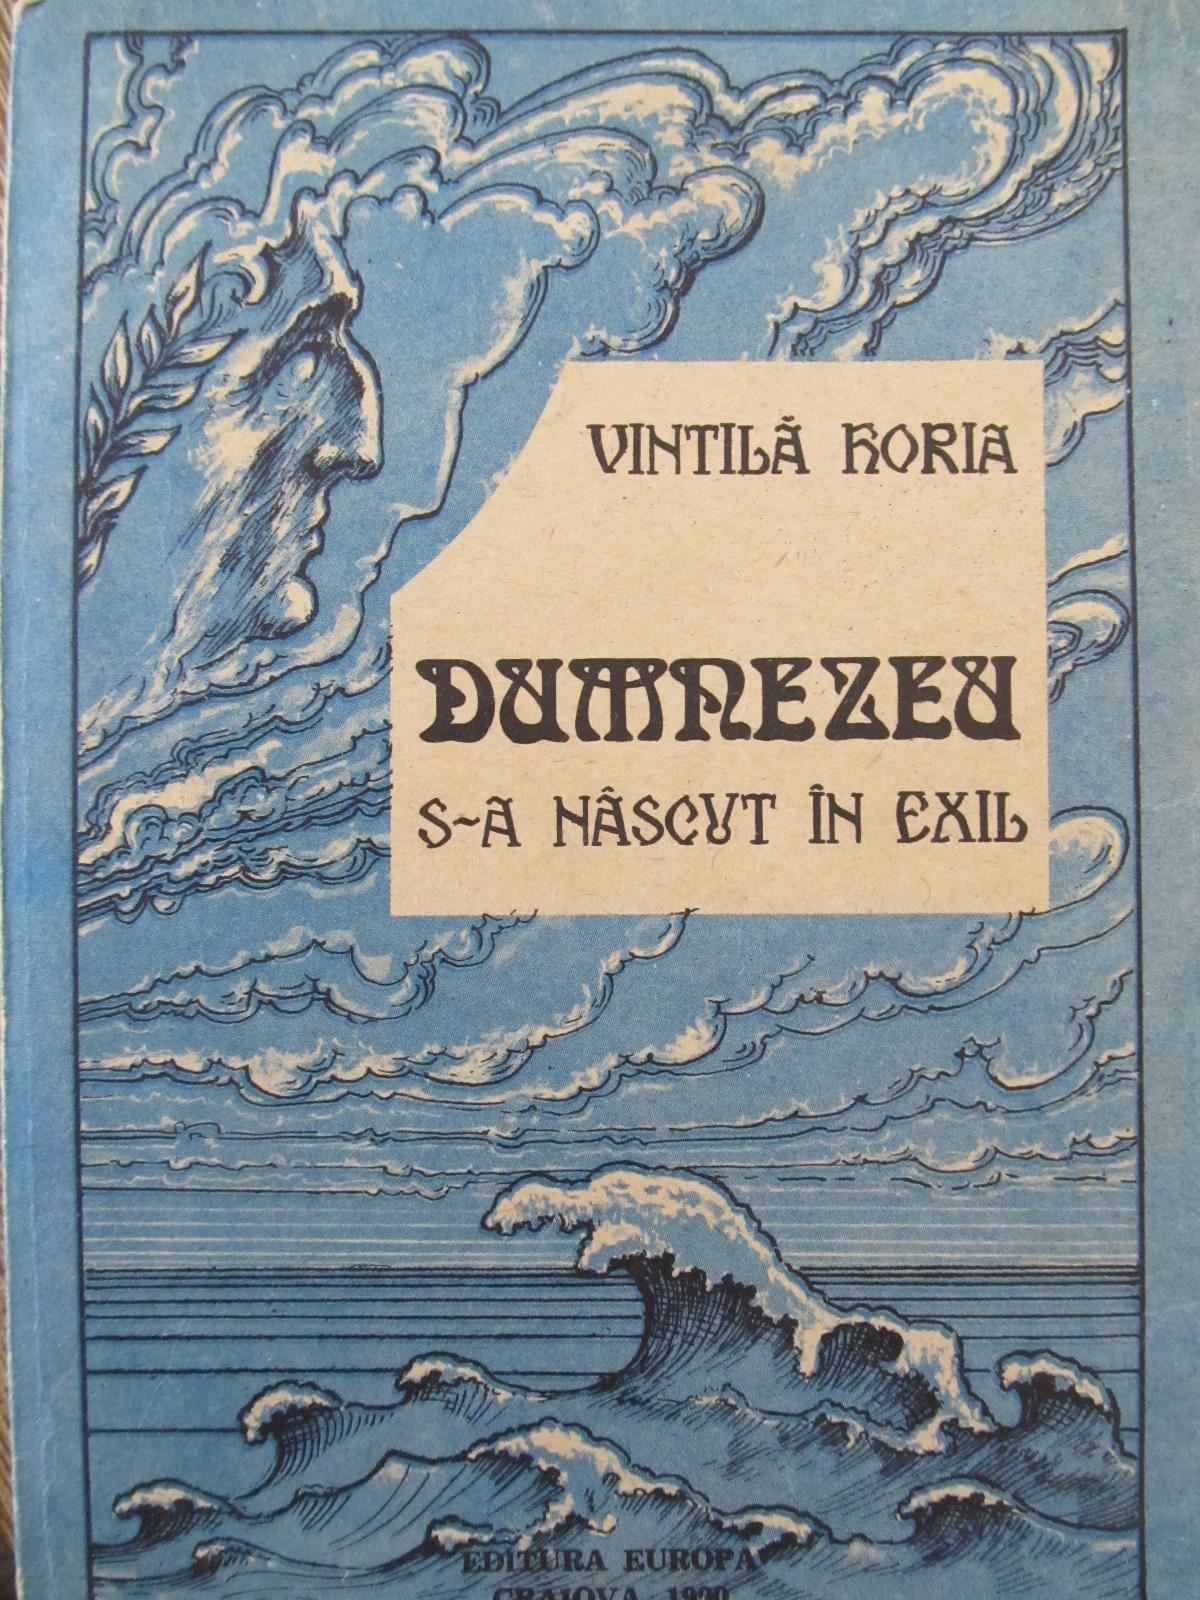 Dumnezeu s-a nascut in exil [1] - Vintila Horia | Detalii carte